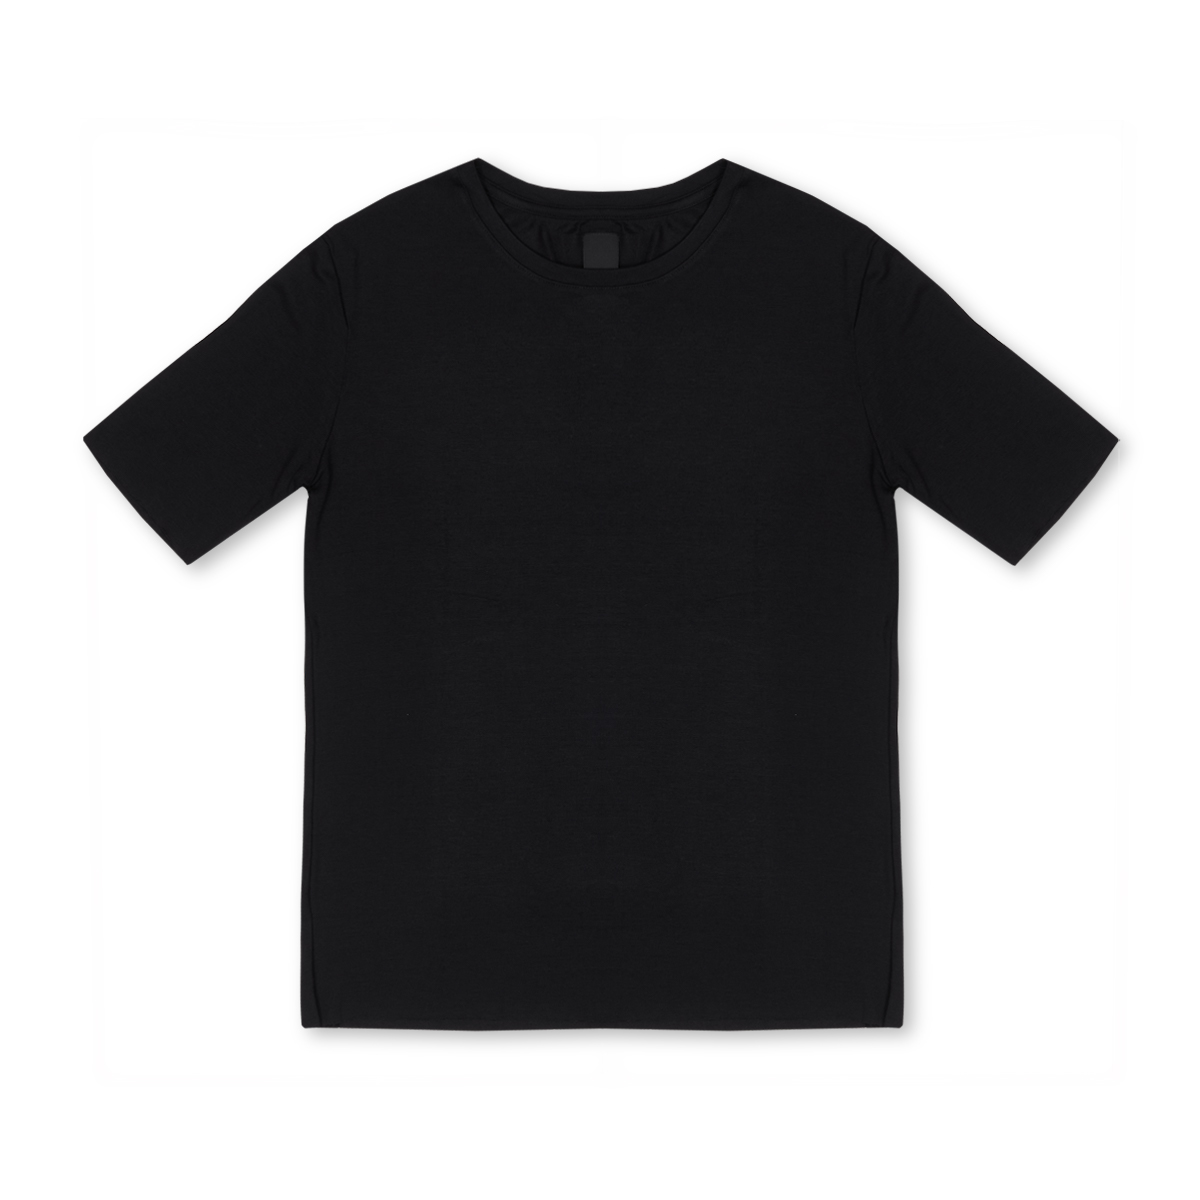 Camiseta SOFT - Preto